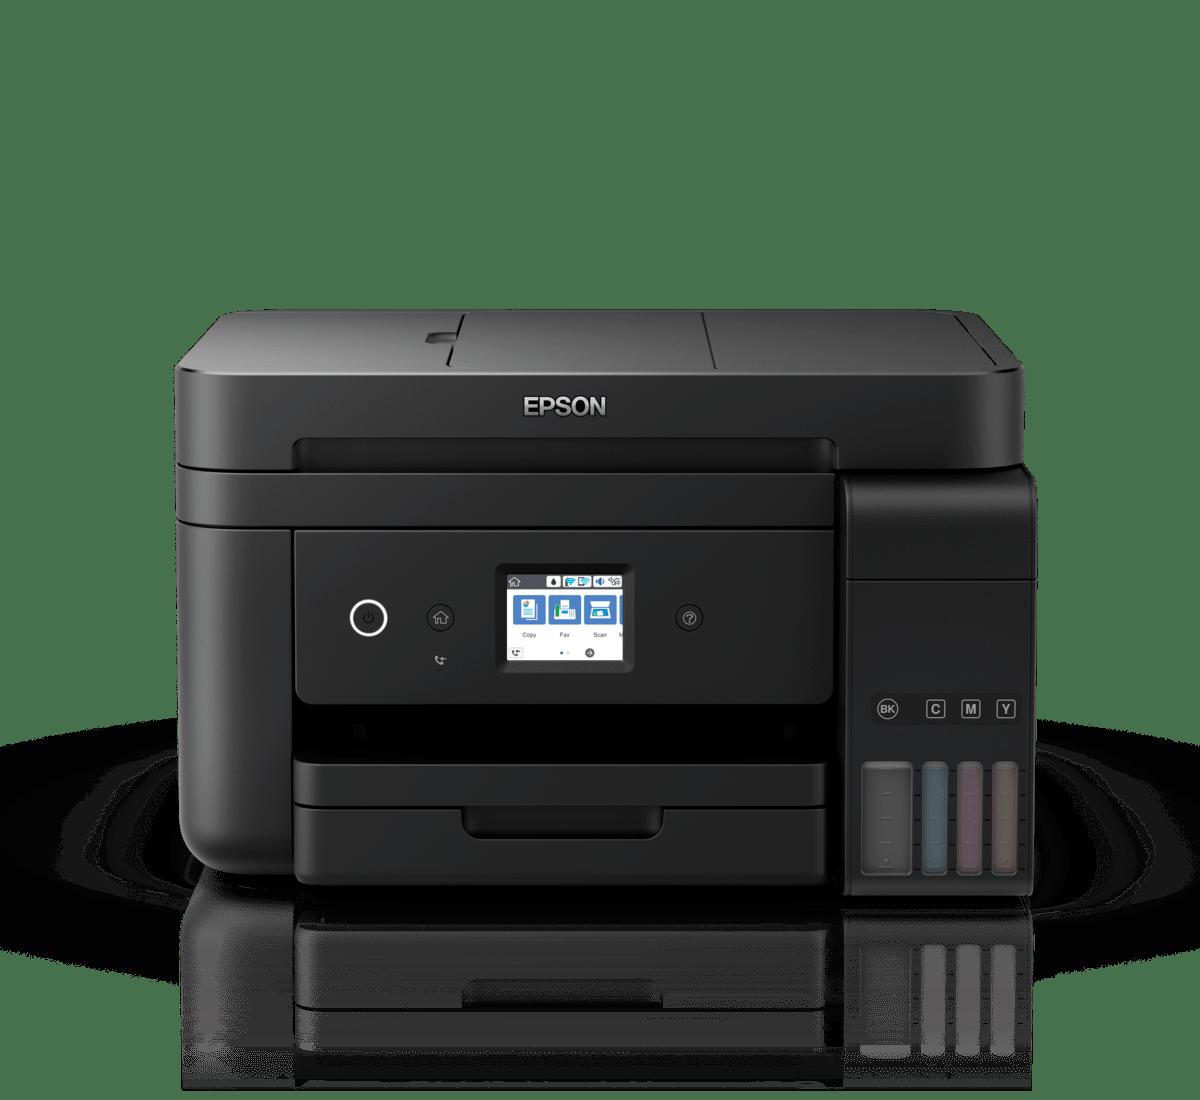 medium resolution of ecotank l6190 wi fi duplex multifunction inktank printer with adf